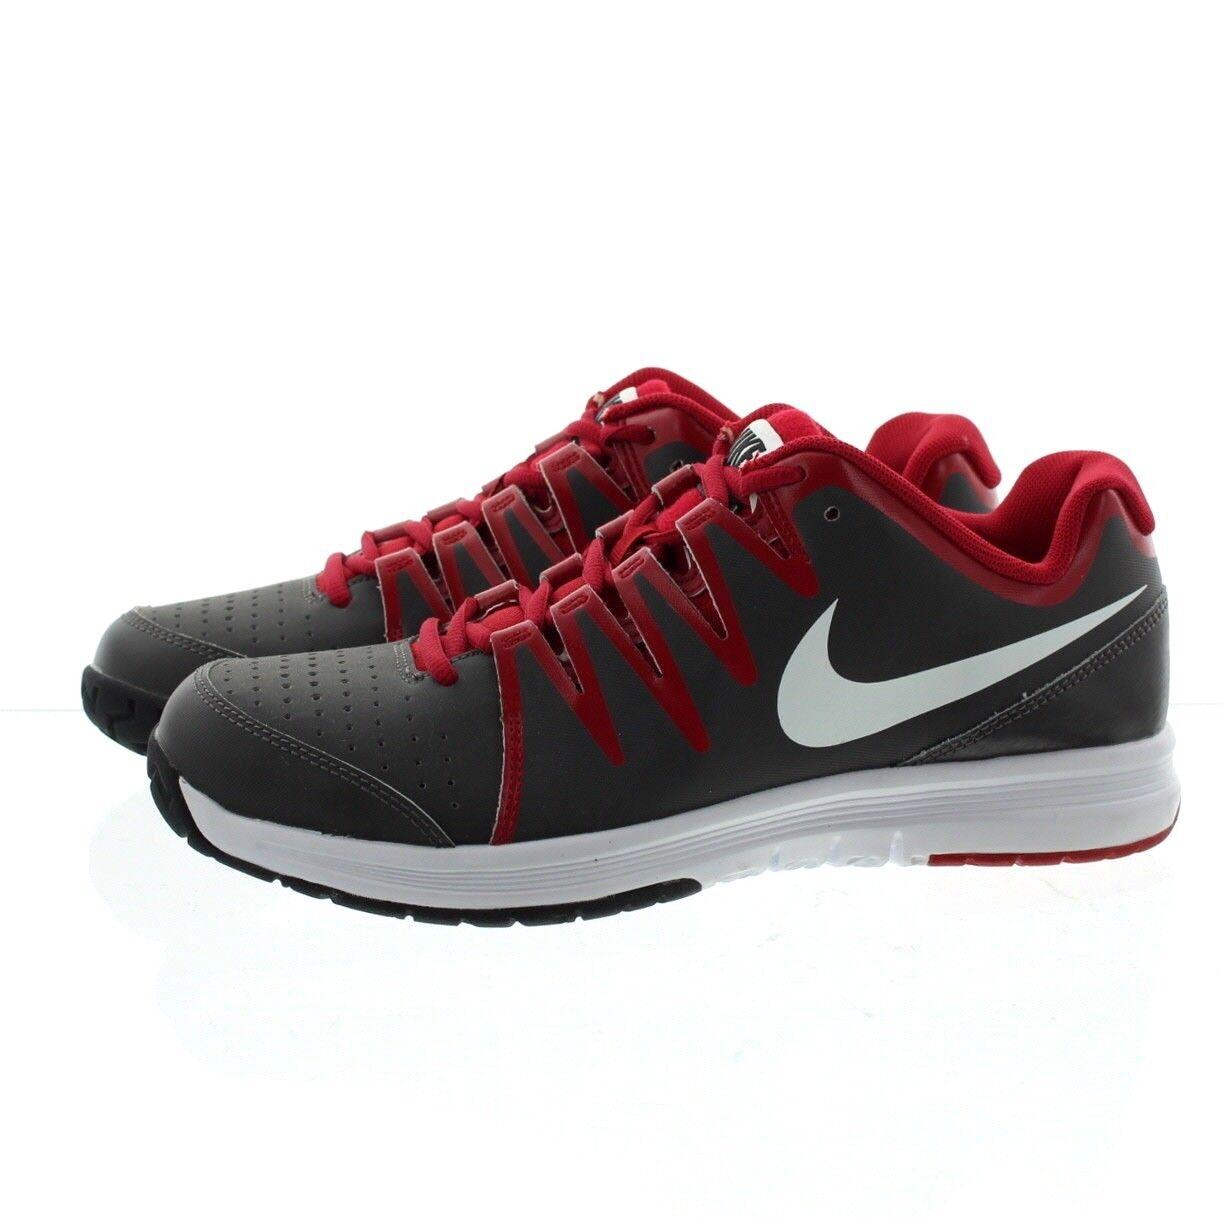 Nike 631703 Mens Vapor Court Tennis Athletic Active Low Top shoes Sneakers